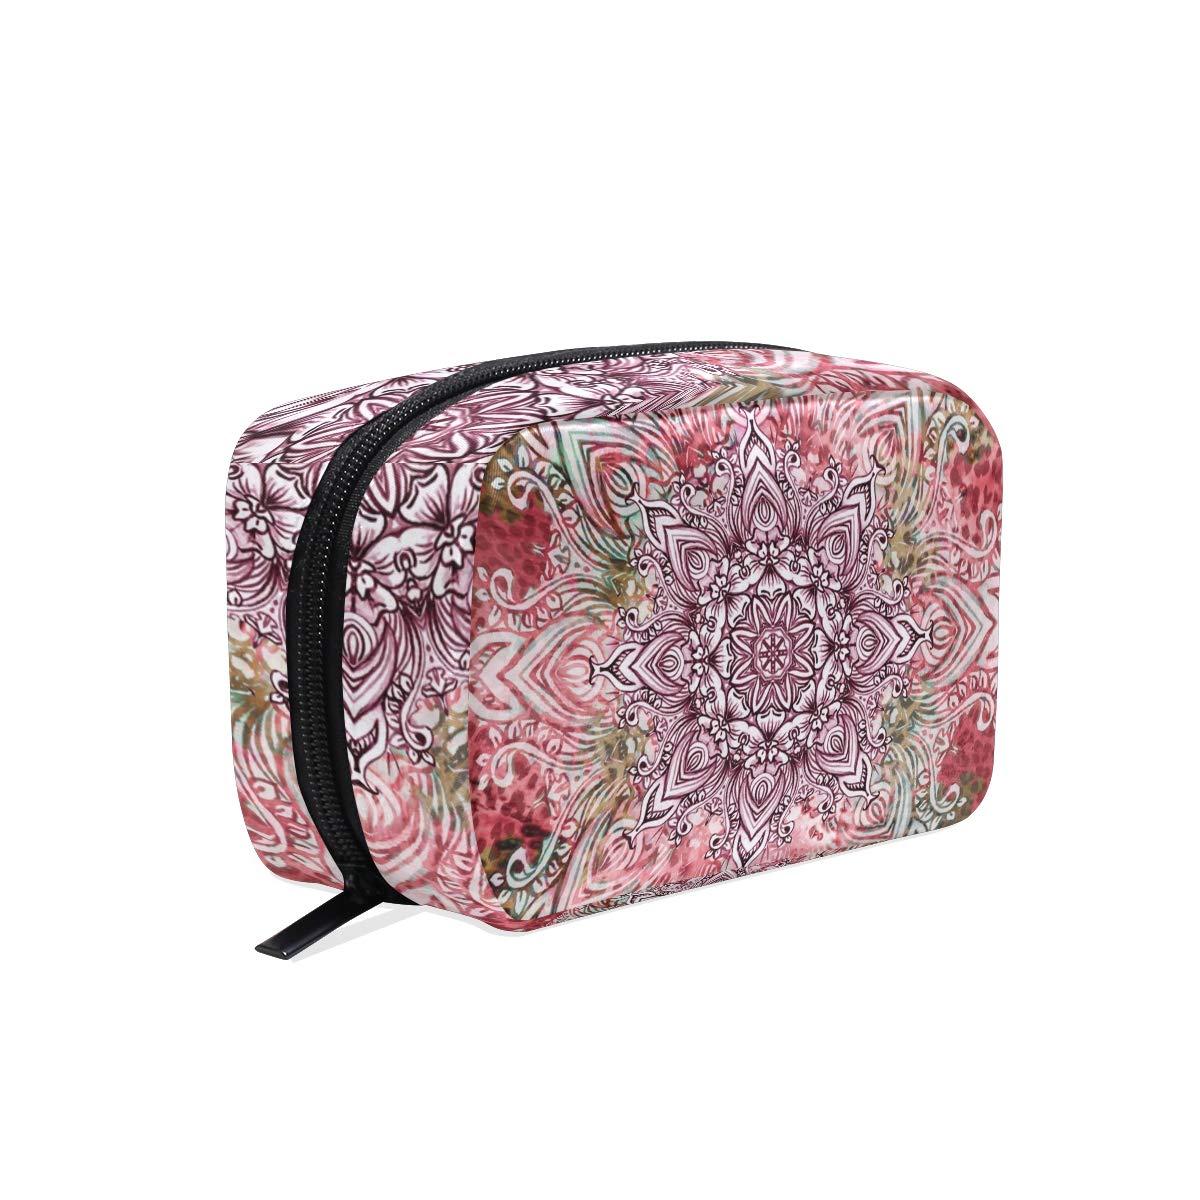 Travel Cosmetic Bag Leopard Makeup Bag Zipper Storage Bag Portable for Ladies women's Travel Square Makeup Brushes Bag